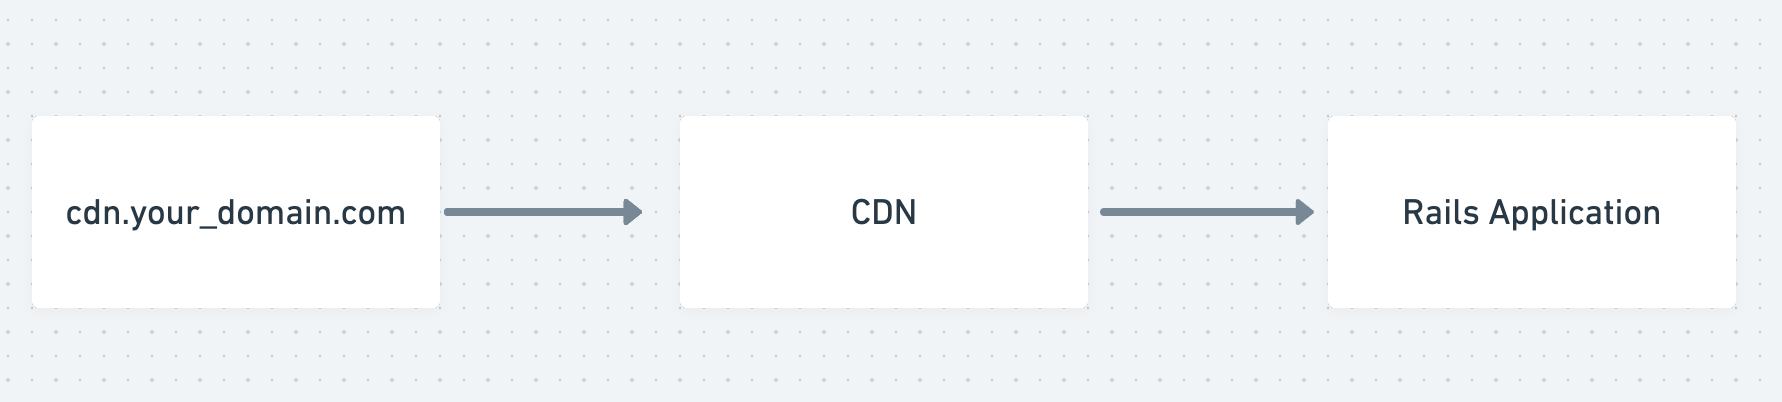 Basic CDN Architecture